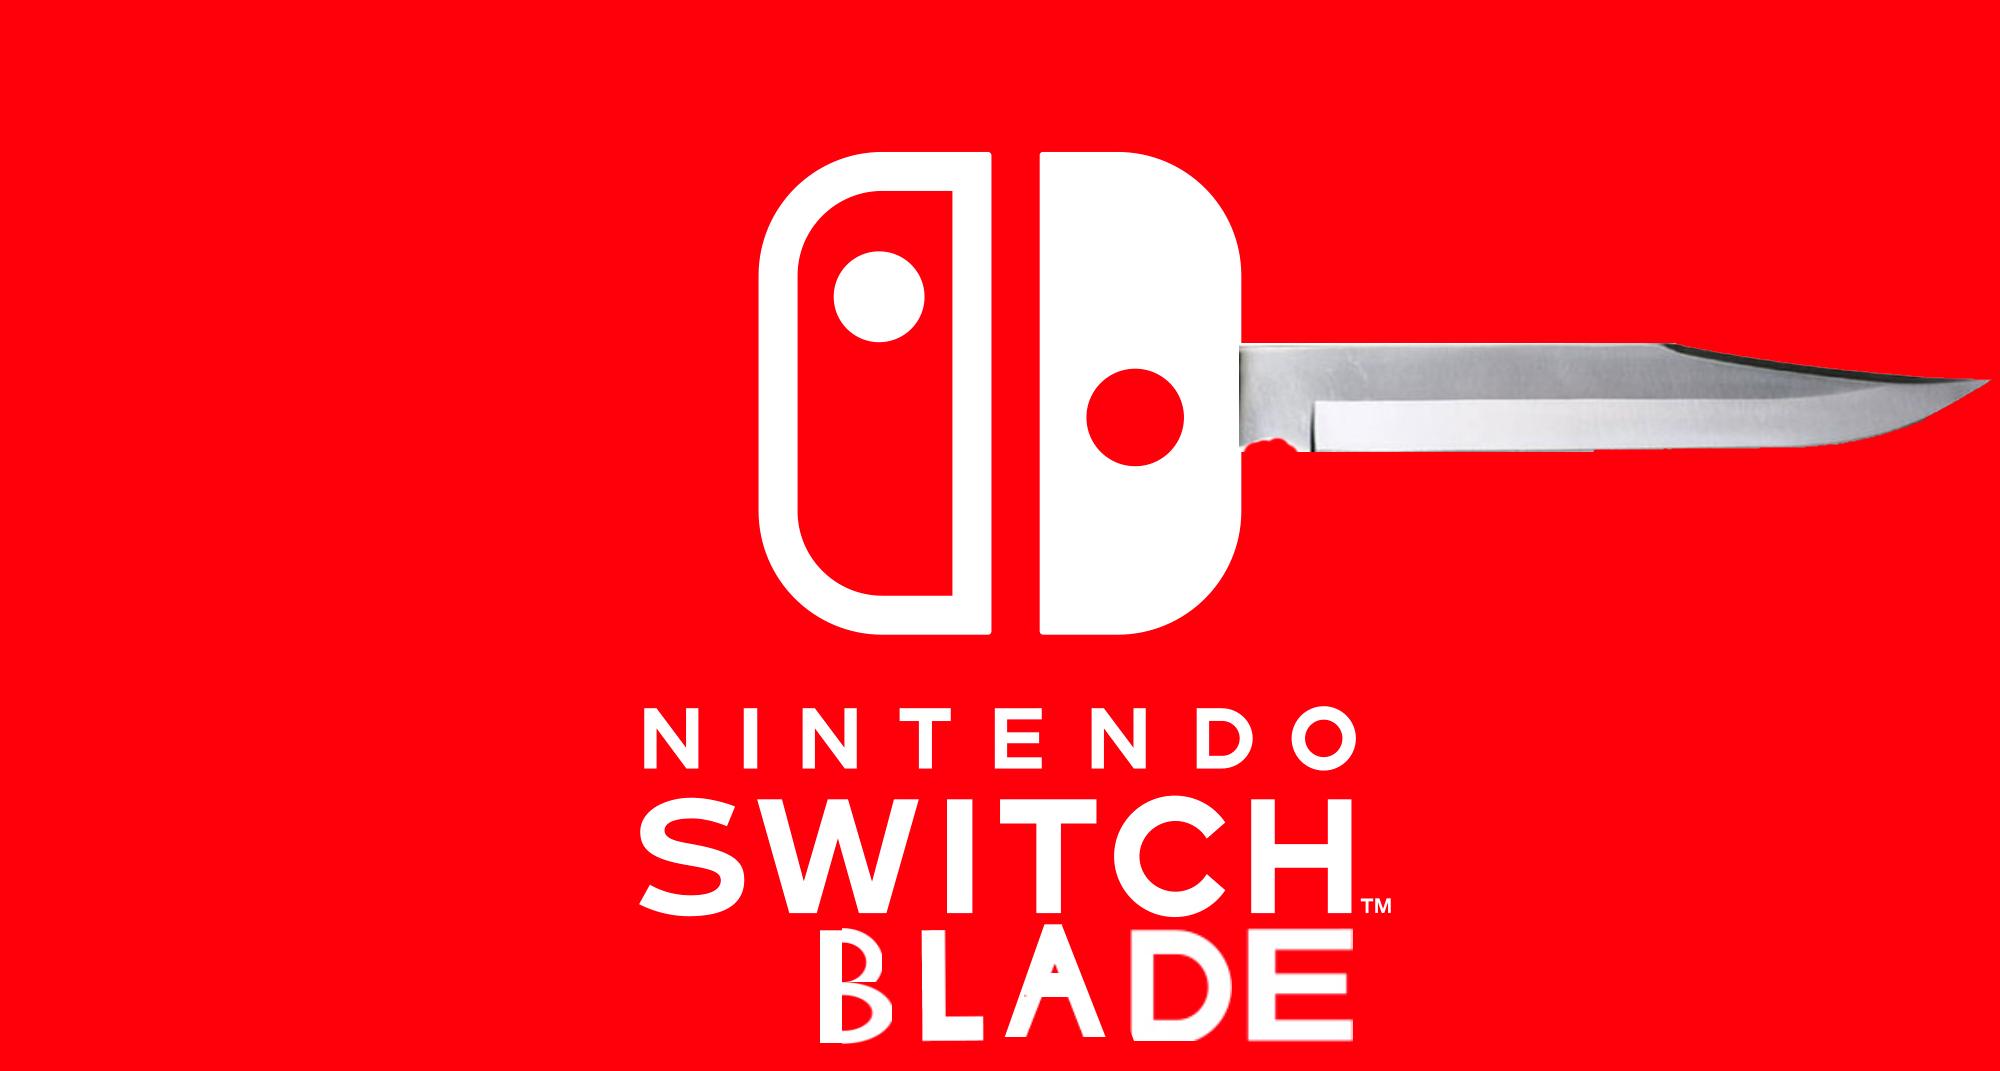 Nintendo Switchblade | Nintendo Switch | Know Your Meme